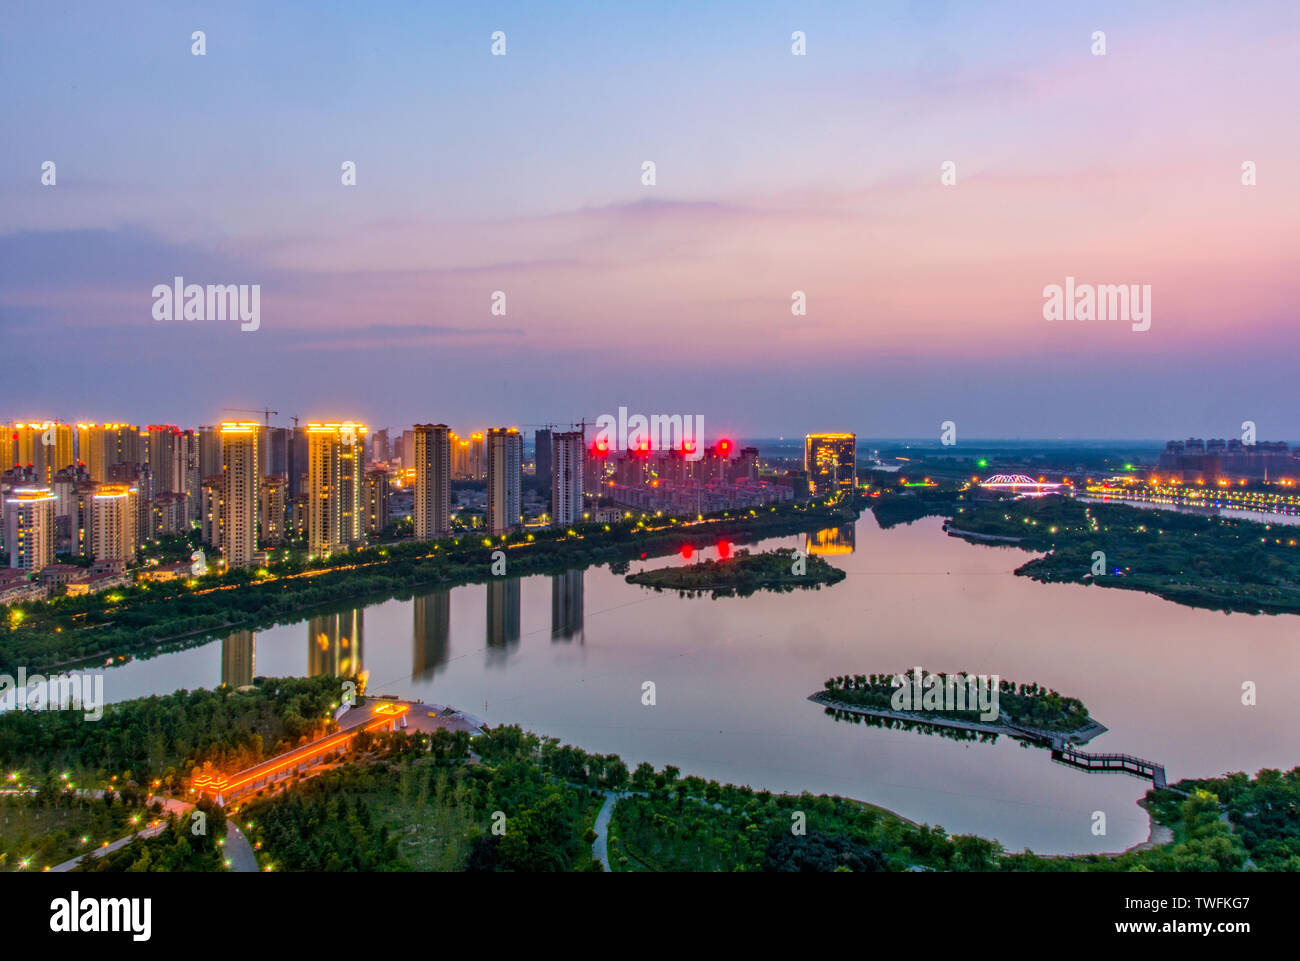 Delta Park, Xianqiao District, Suzhou City Stock Photo